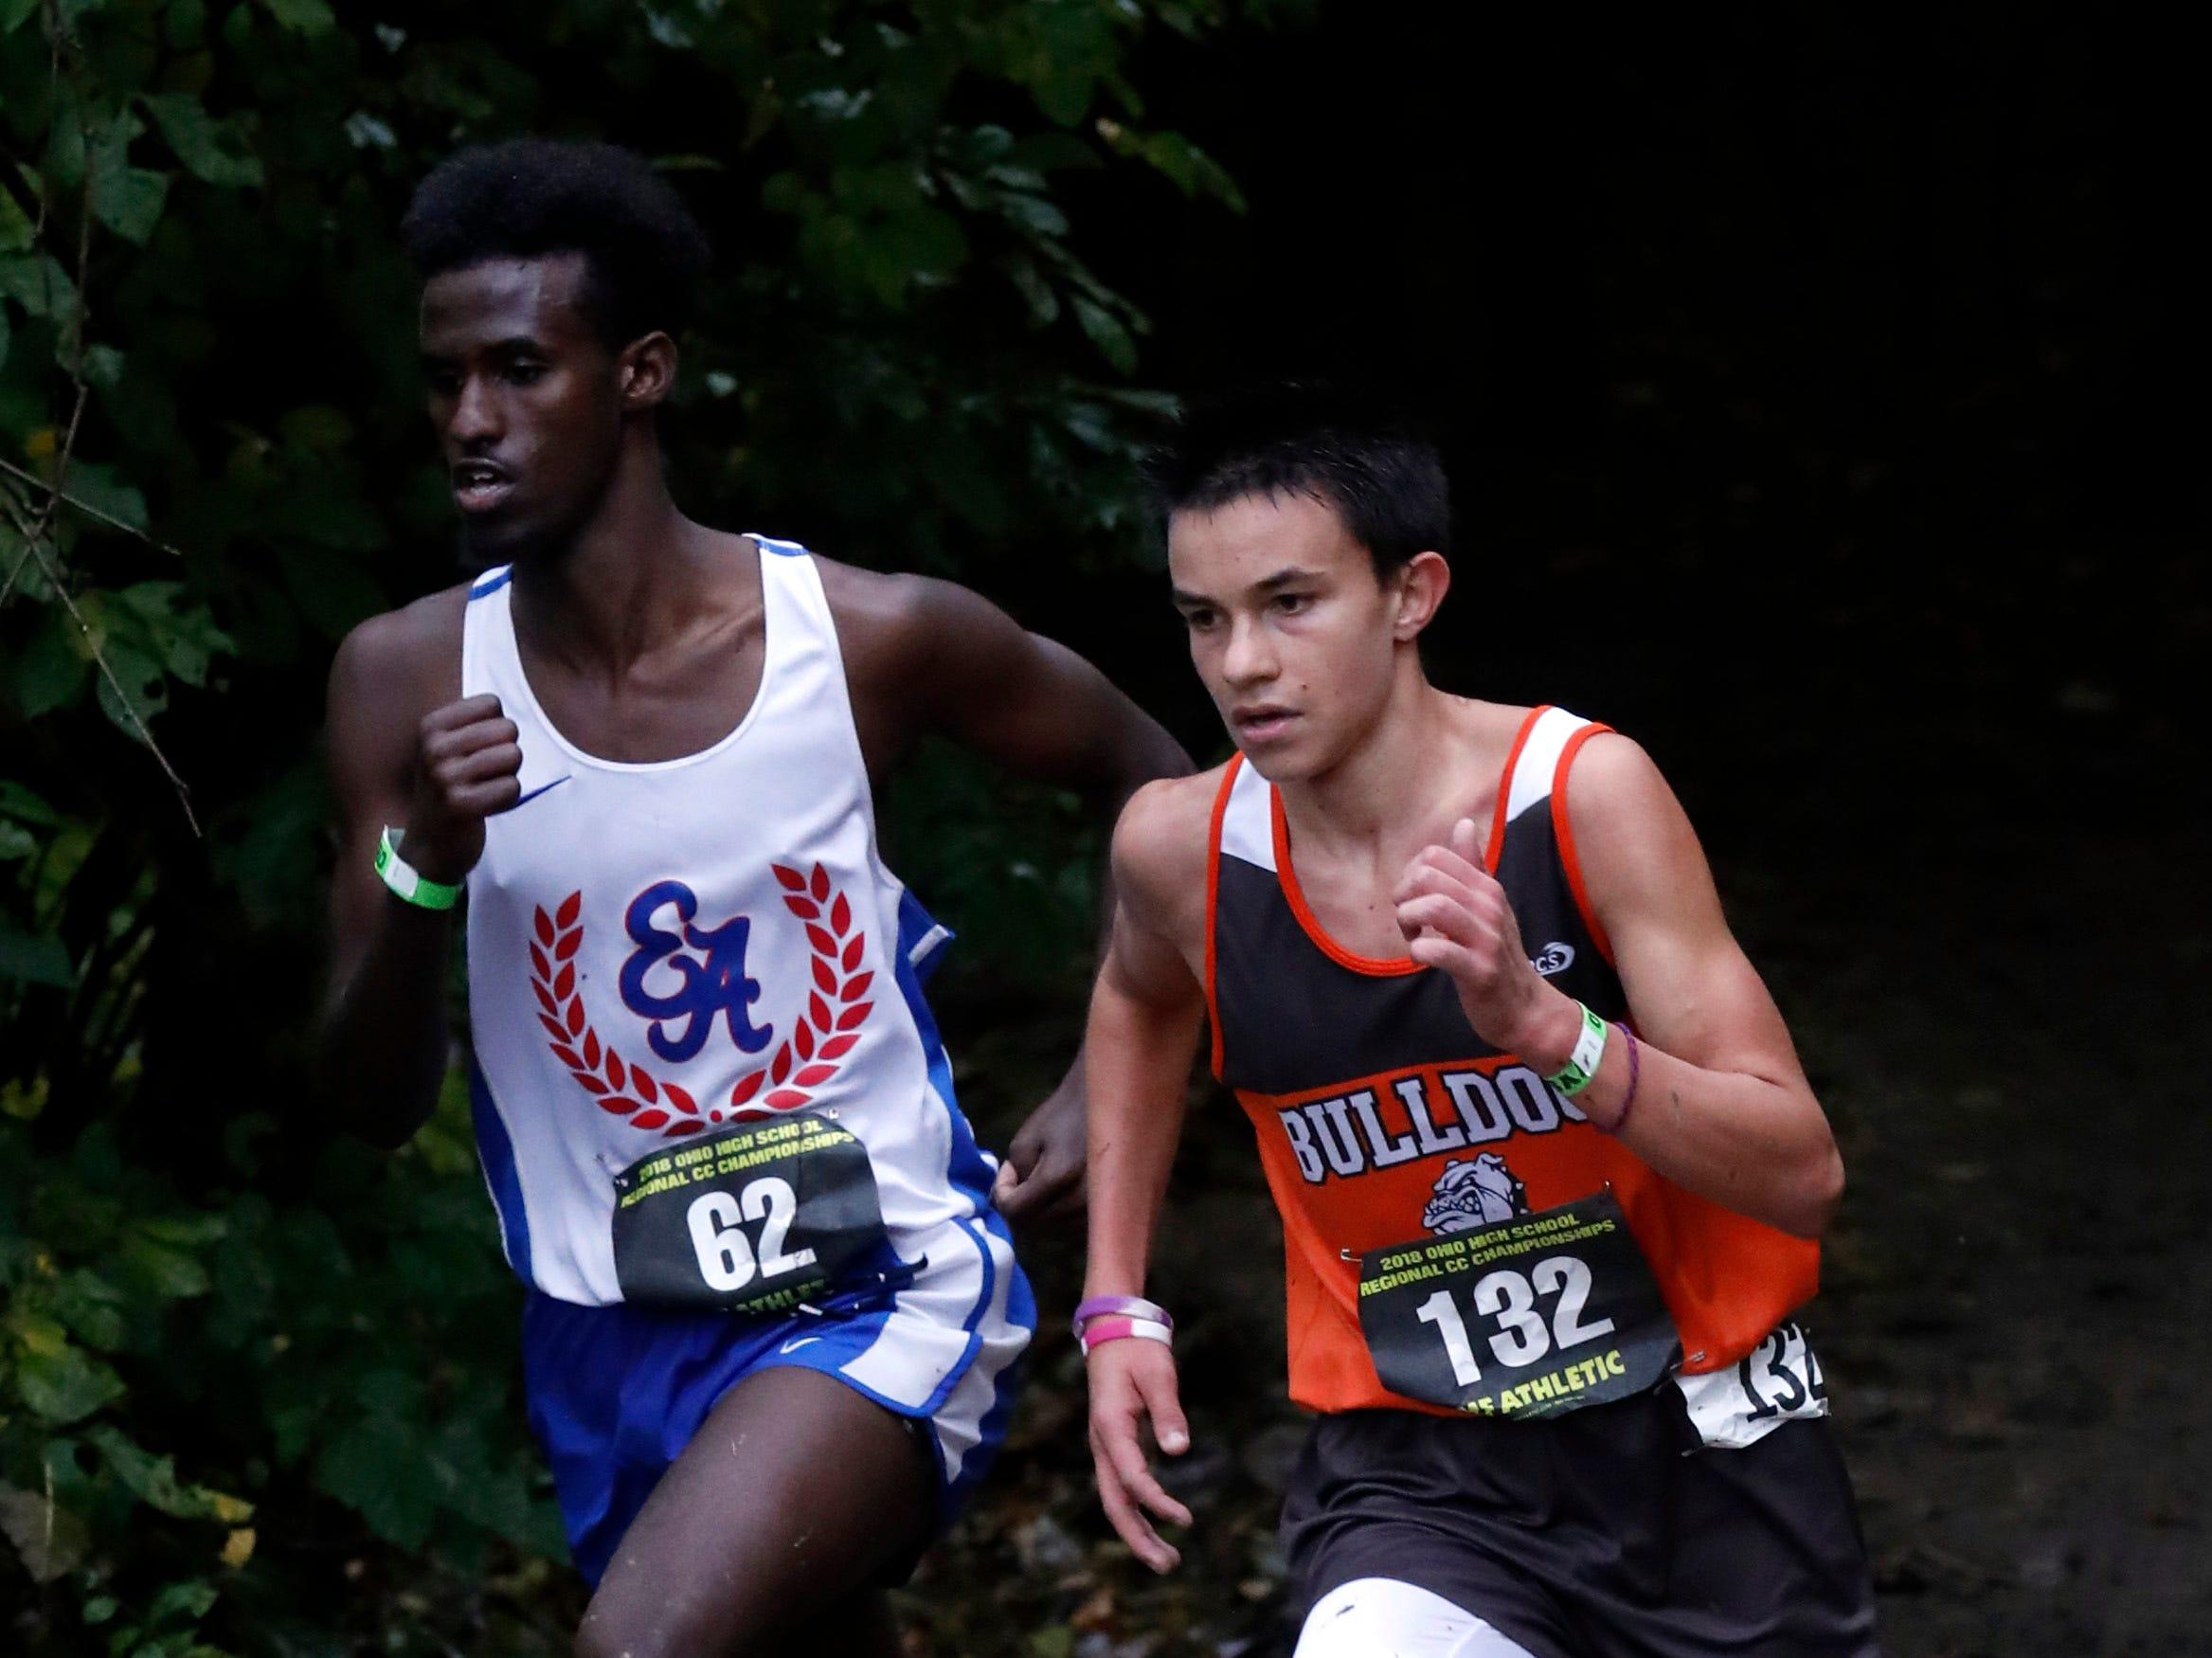 Heath's Xavier Foehl runs in the Regional Cross Country meet Saturday, Oct. 27, 2018, at Pickerington North High School in Pickerington.